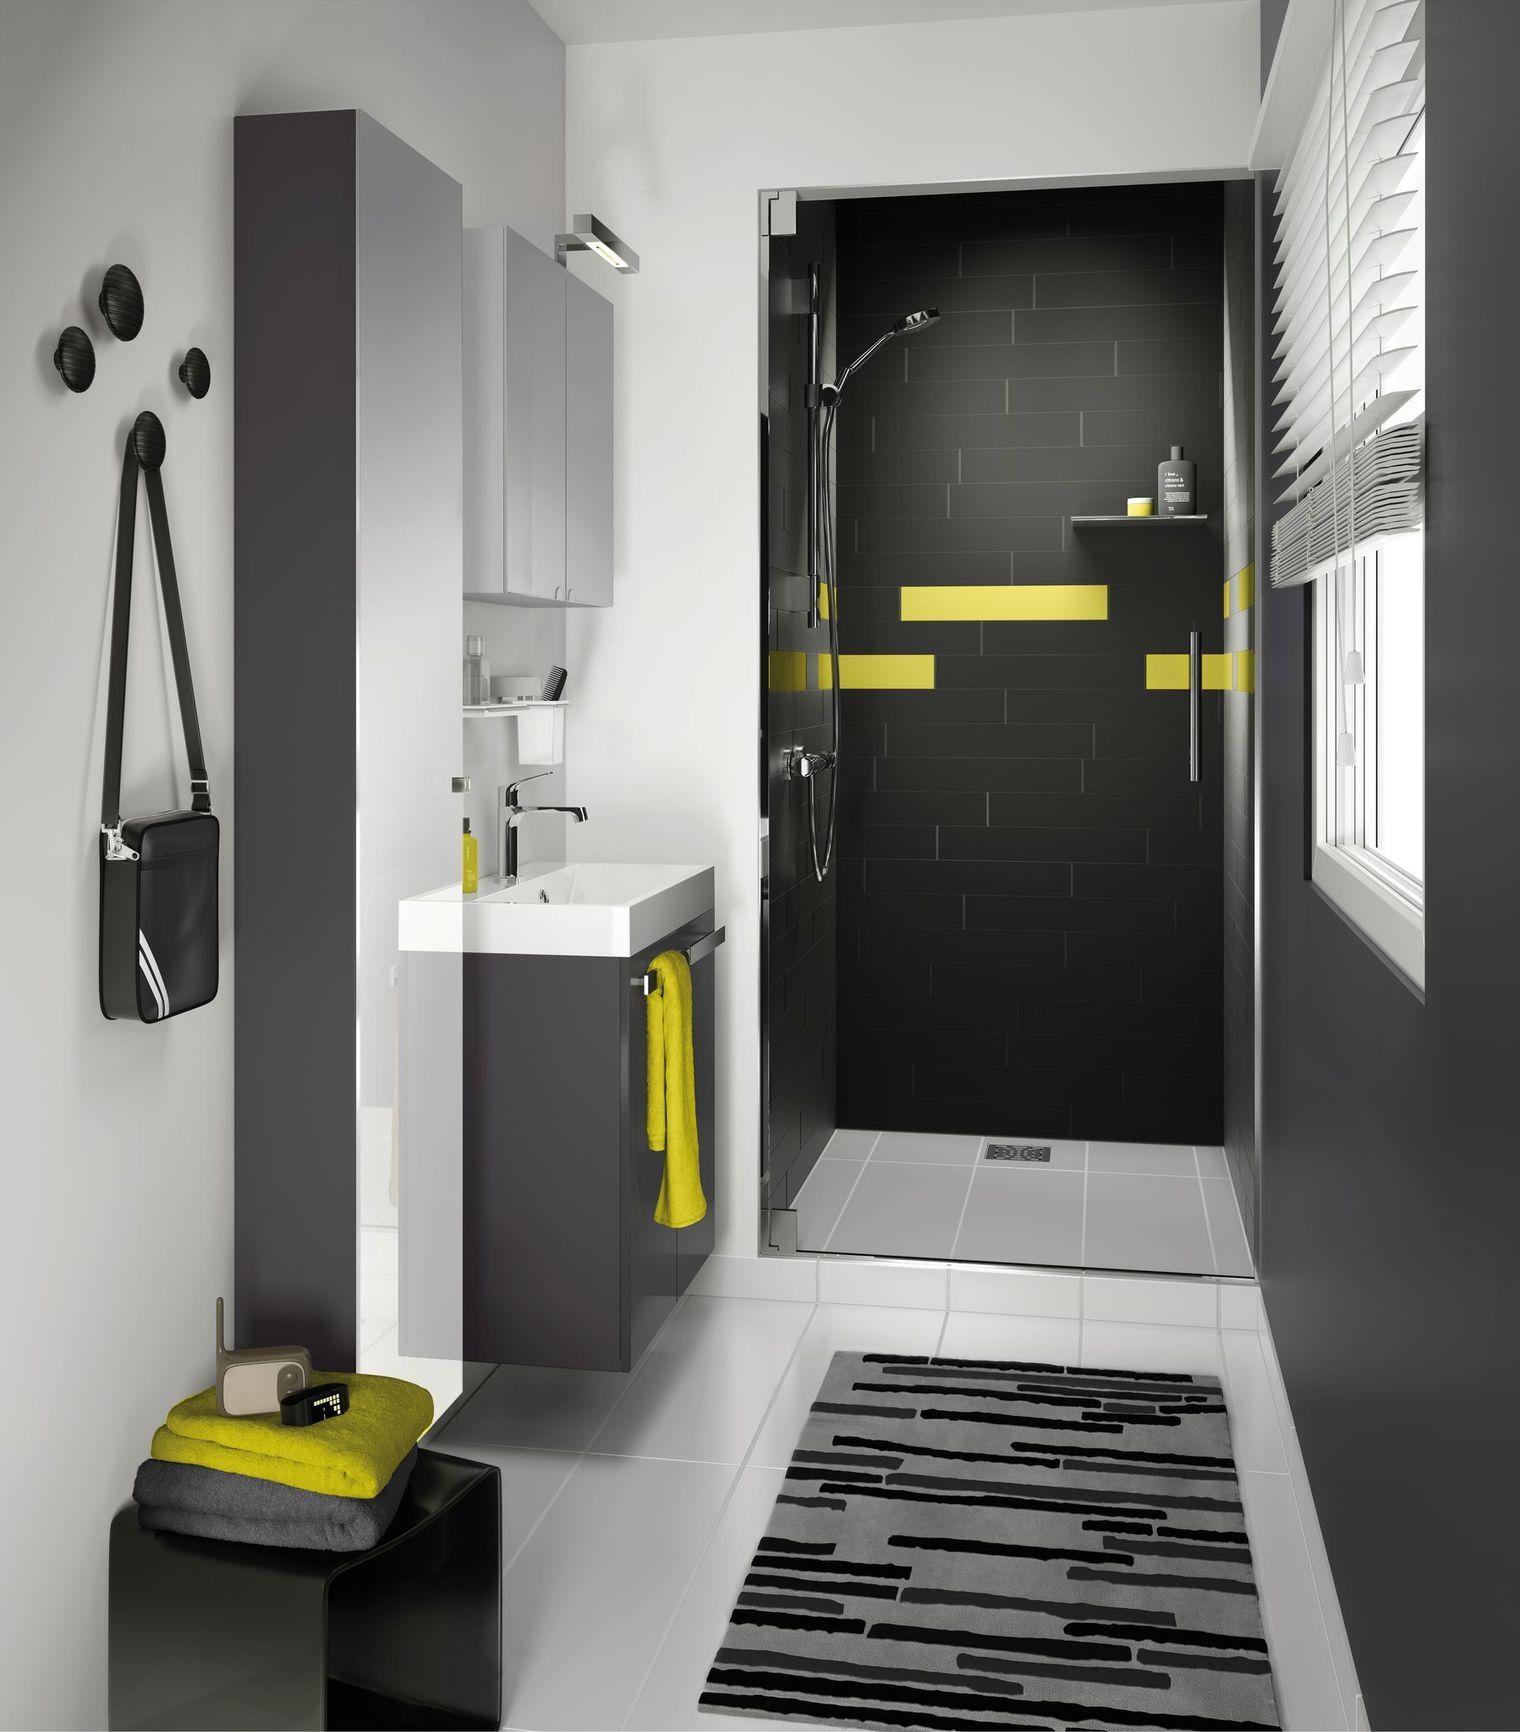 salle de bain 2m2 design maison petite